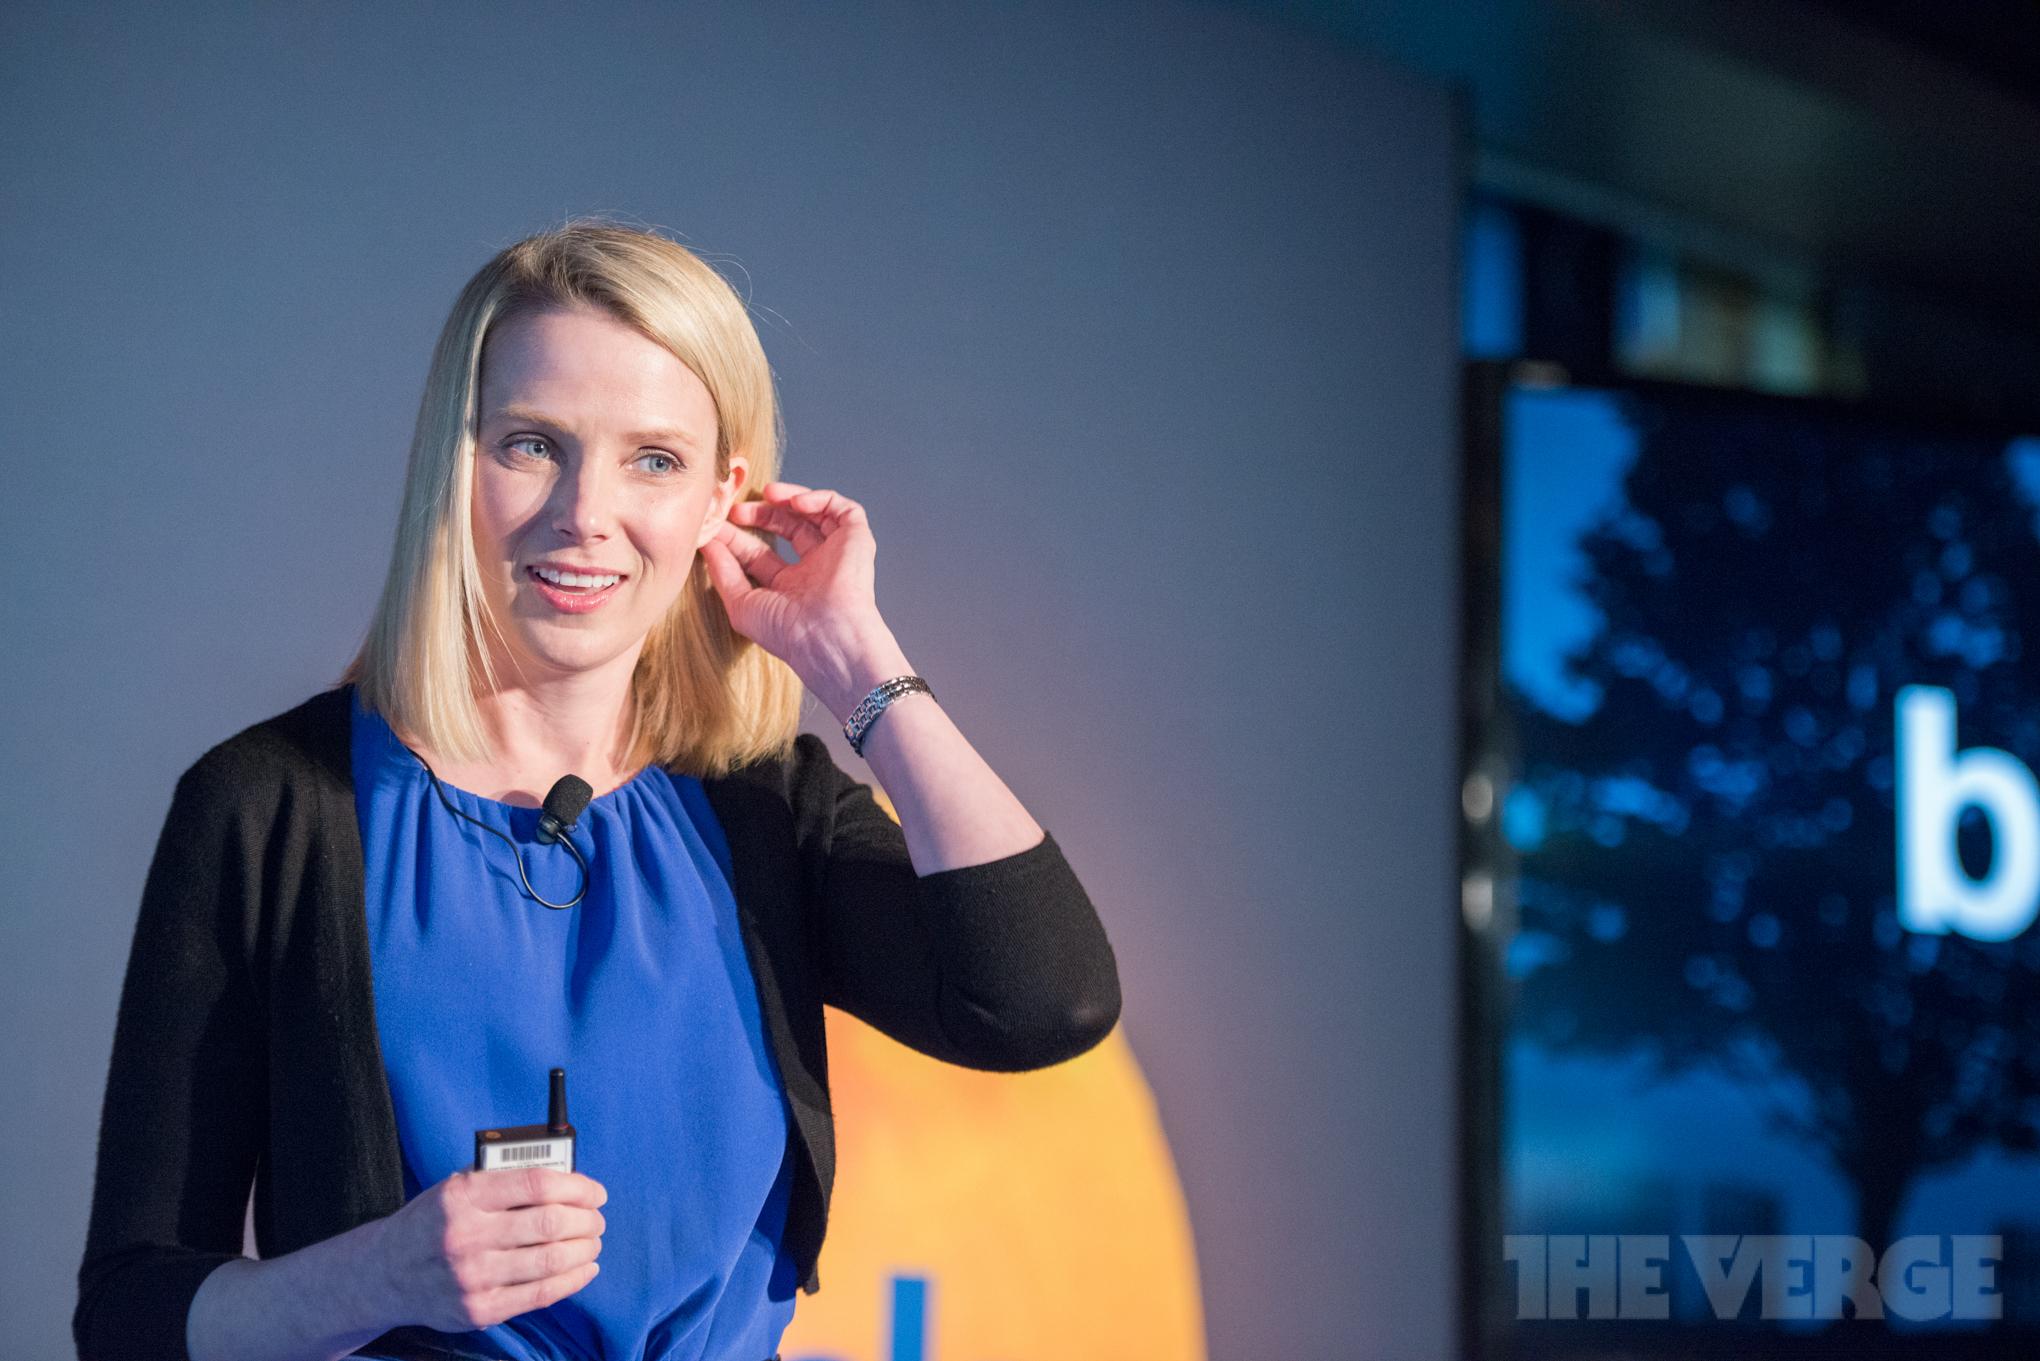 After installing Marissa Mayer at Yahoo, activist investor Dan Loeb exits with a tidy profit